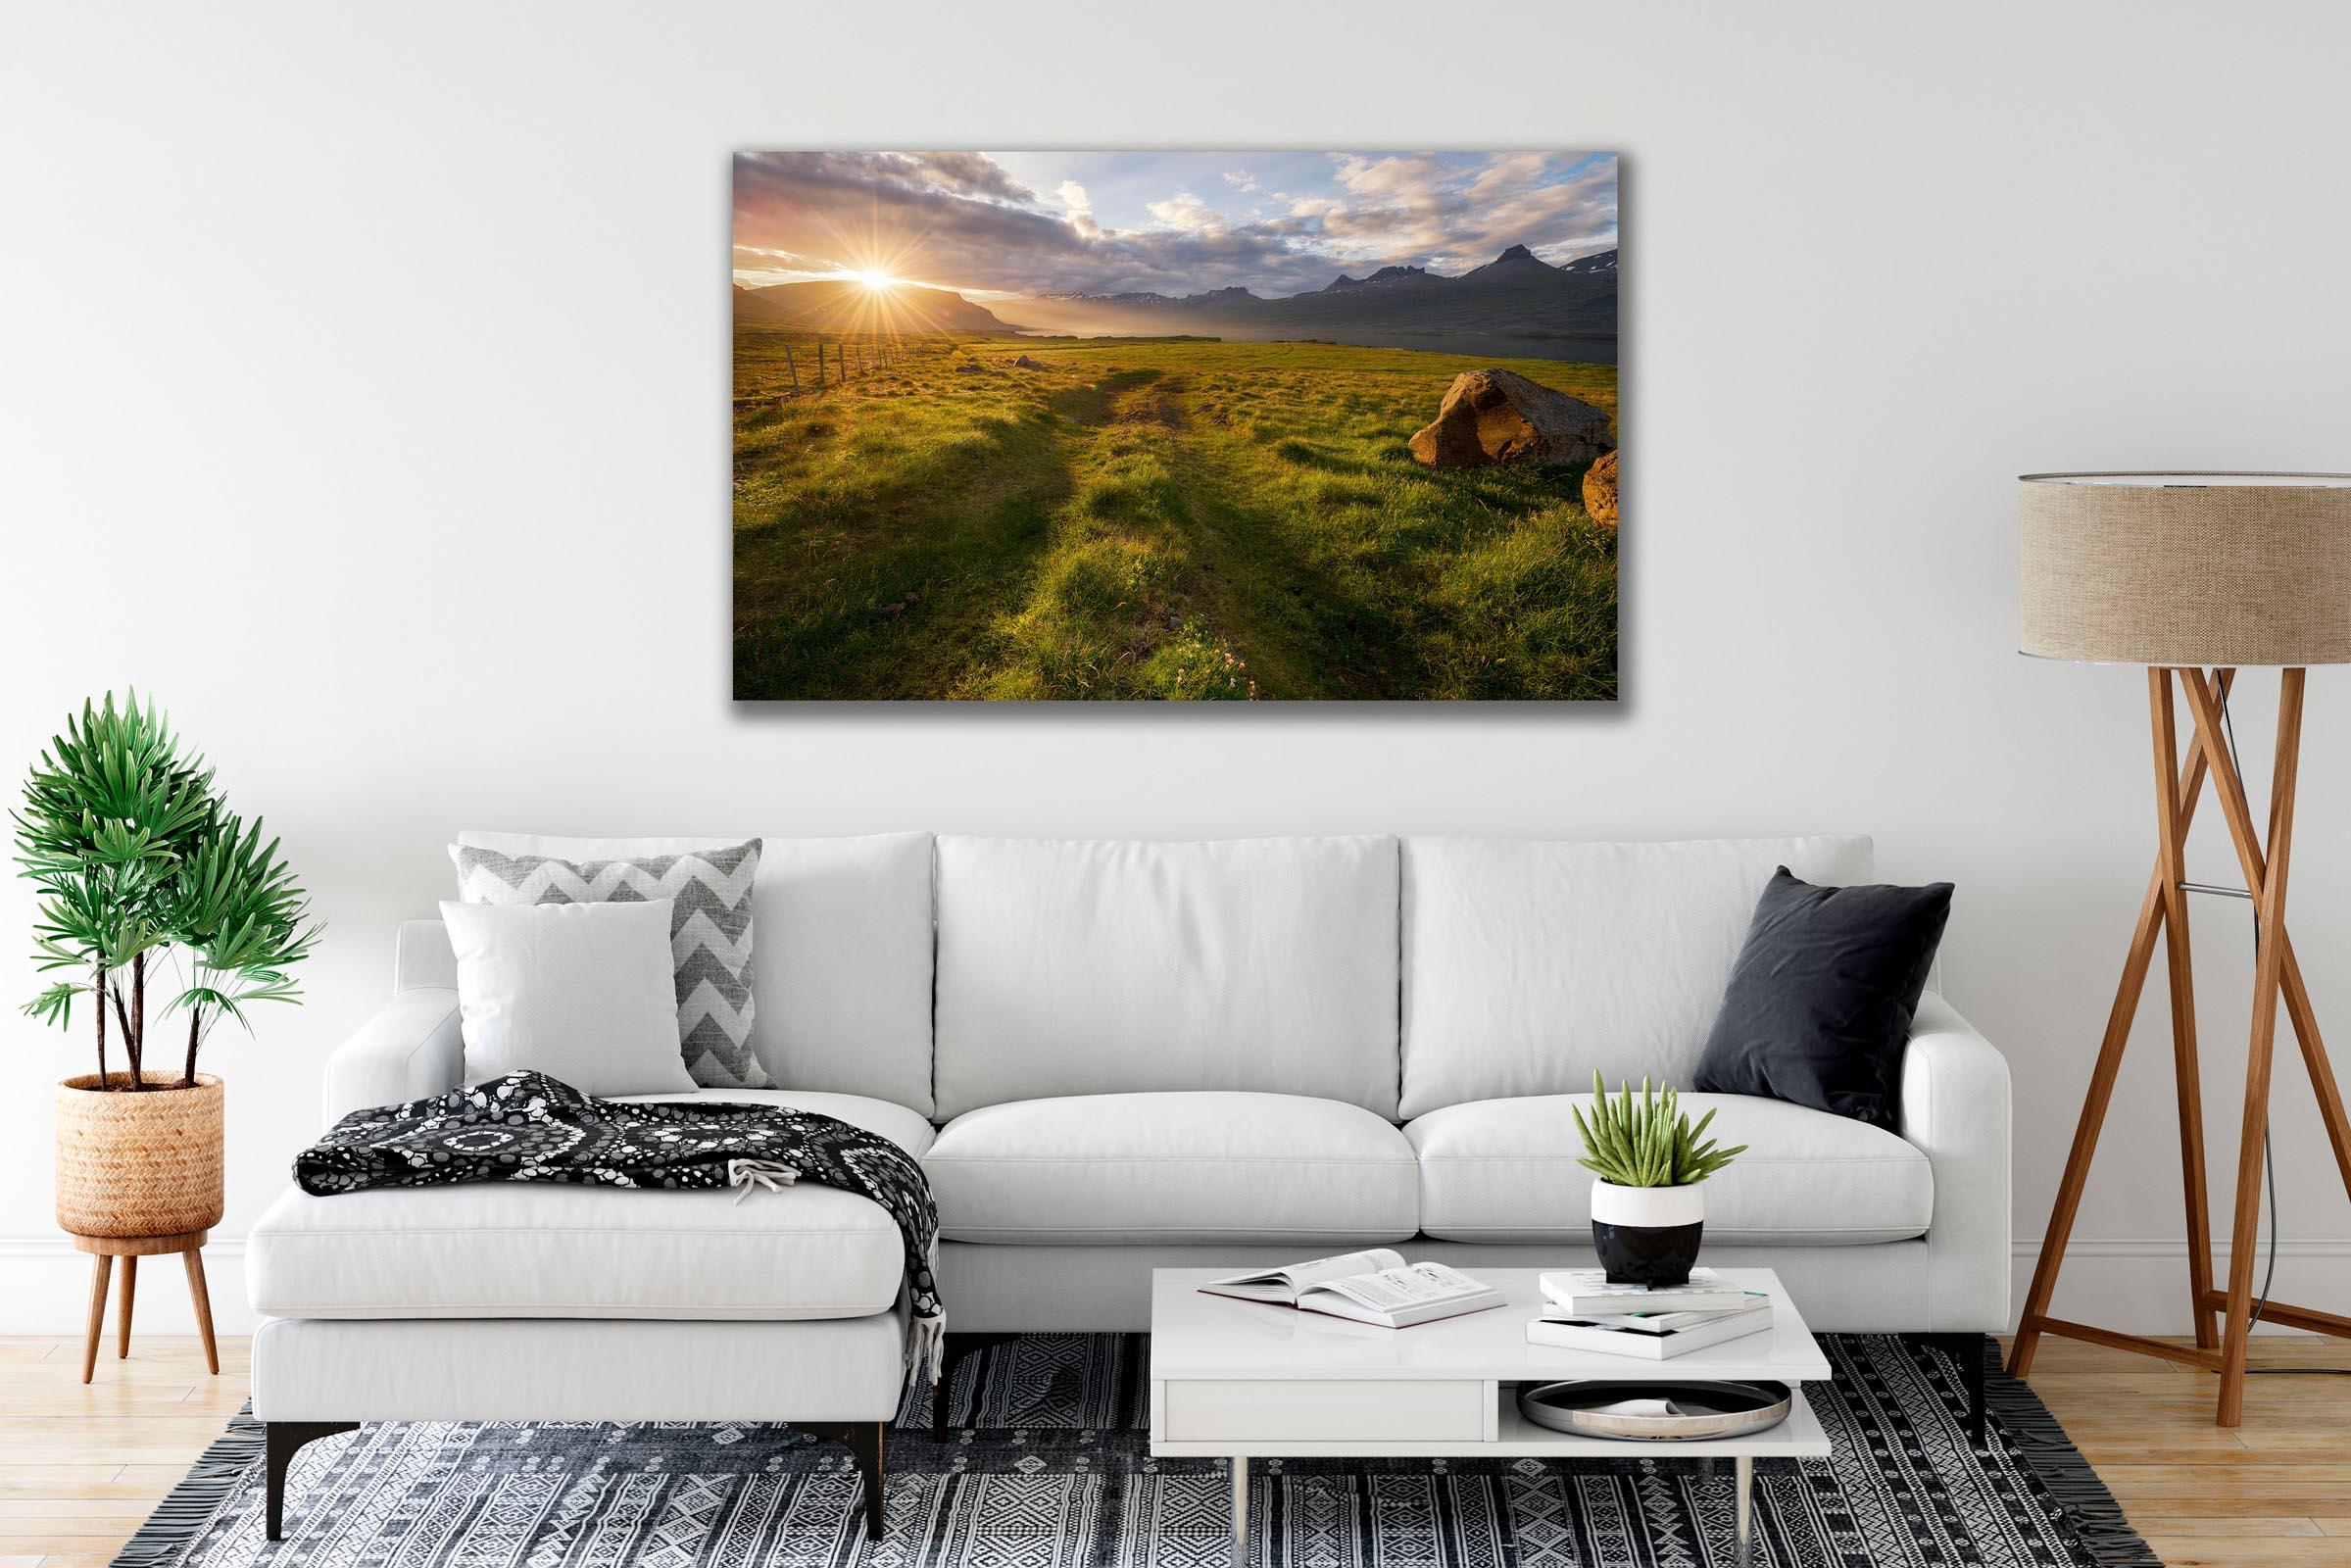 Wall art of Sunburst Meadow in Djupivogur, Iceland by Brent Goldman Photography